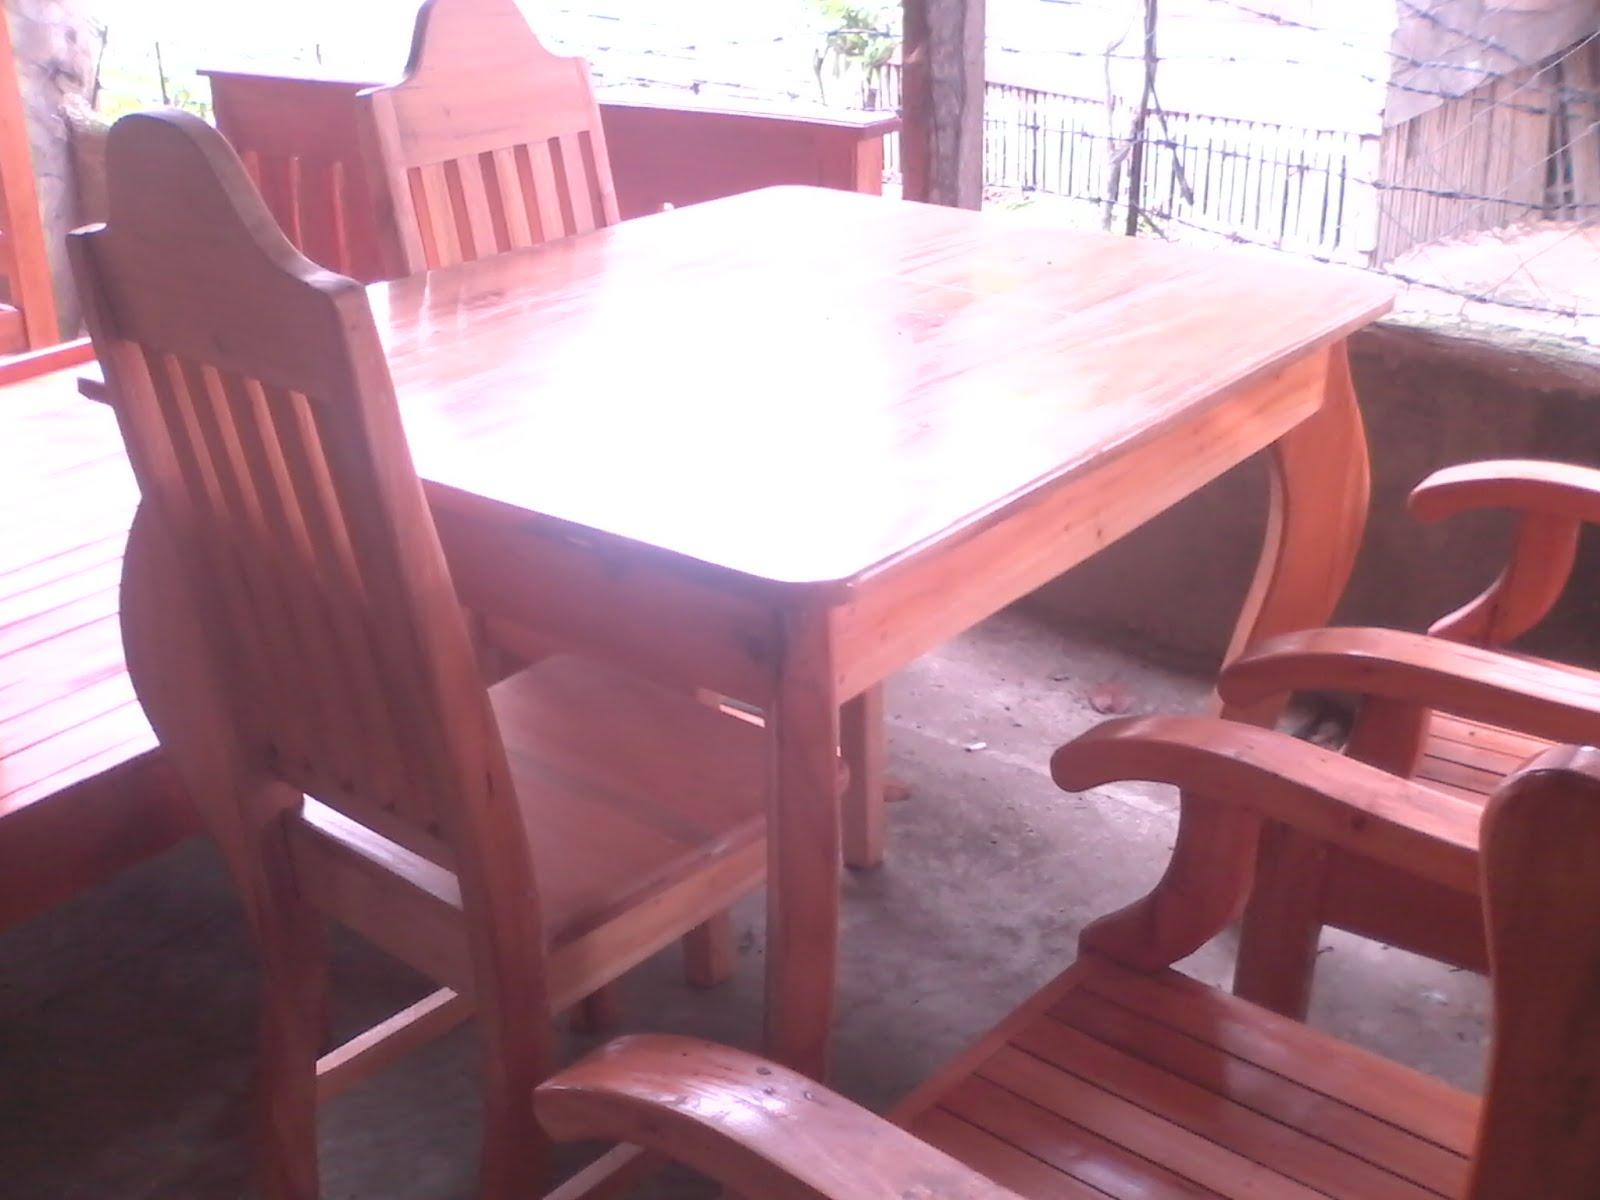 Wooden crib for sale in cebu - Wooden Crib